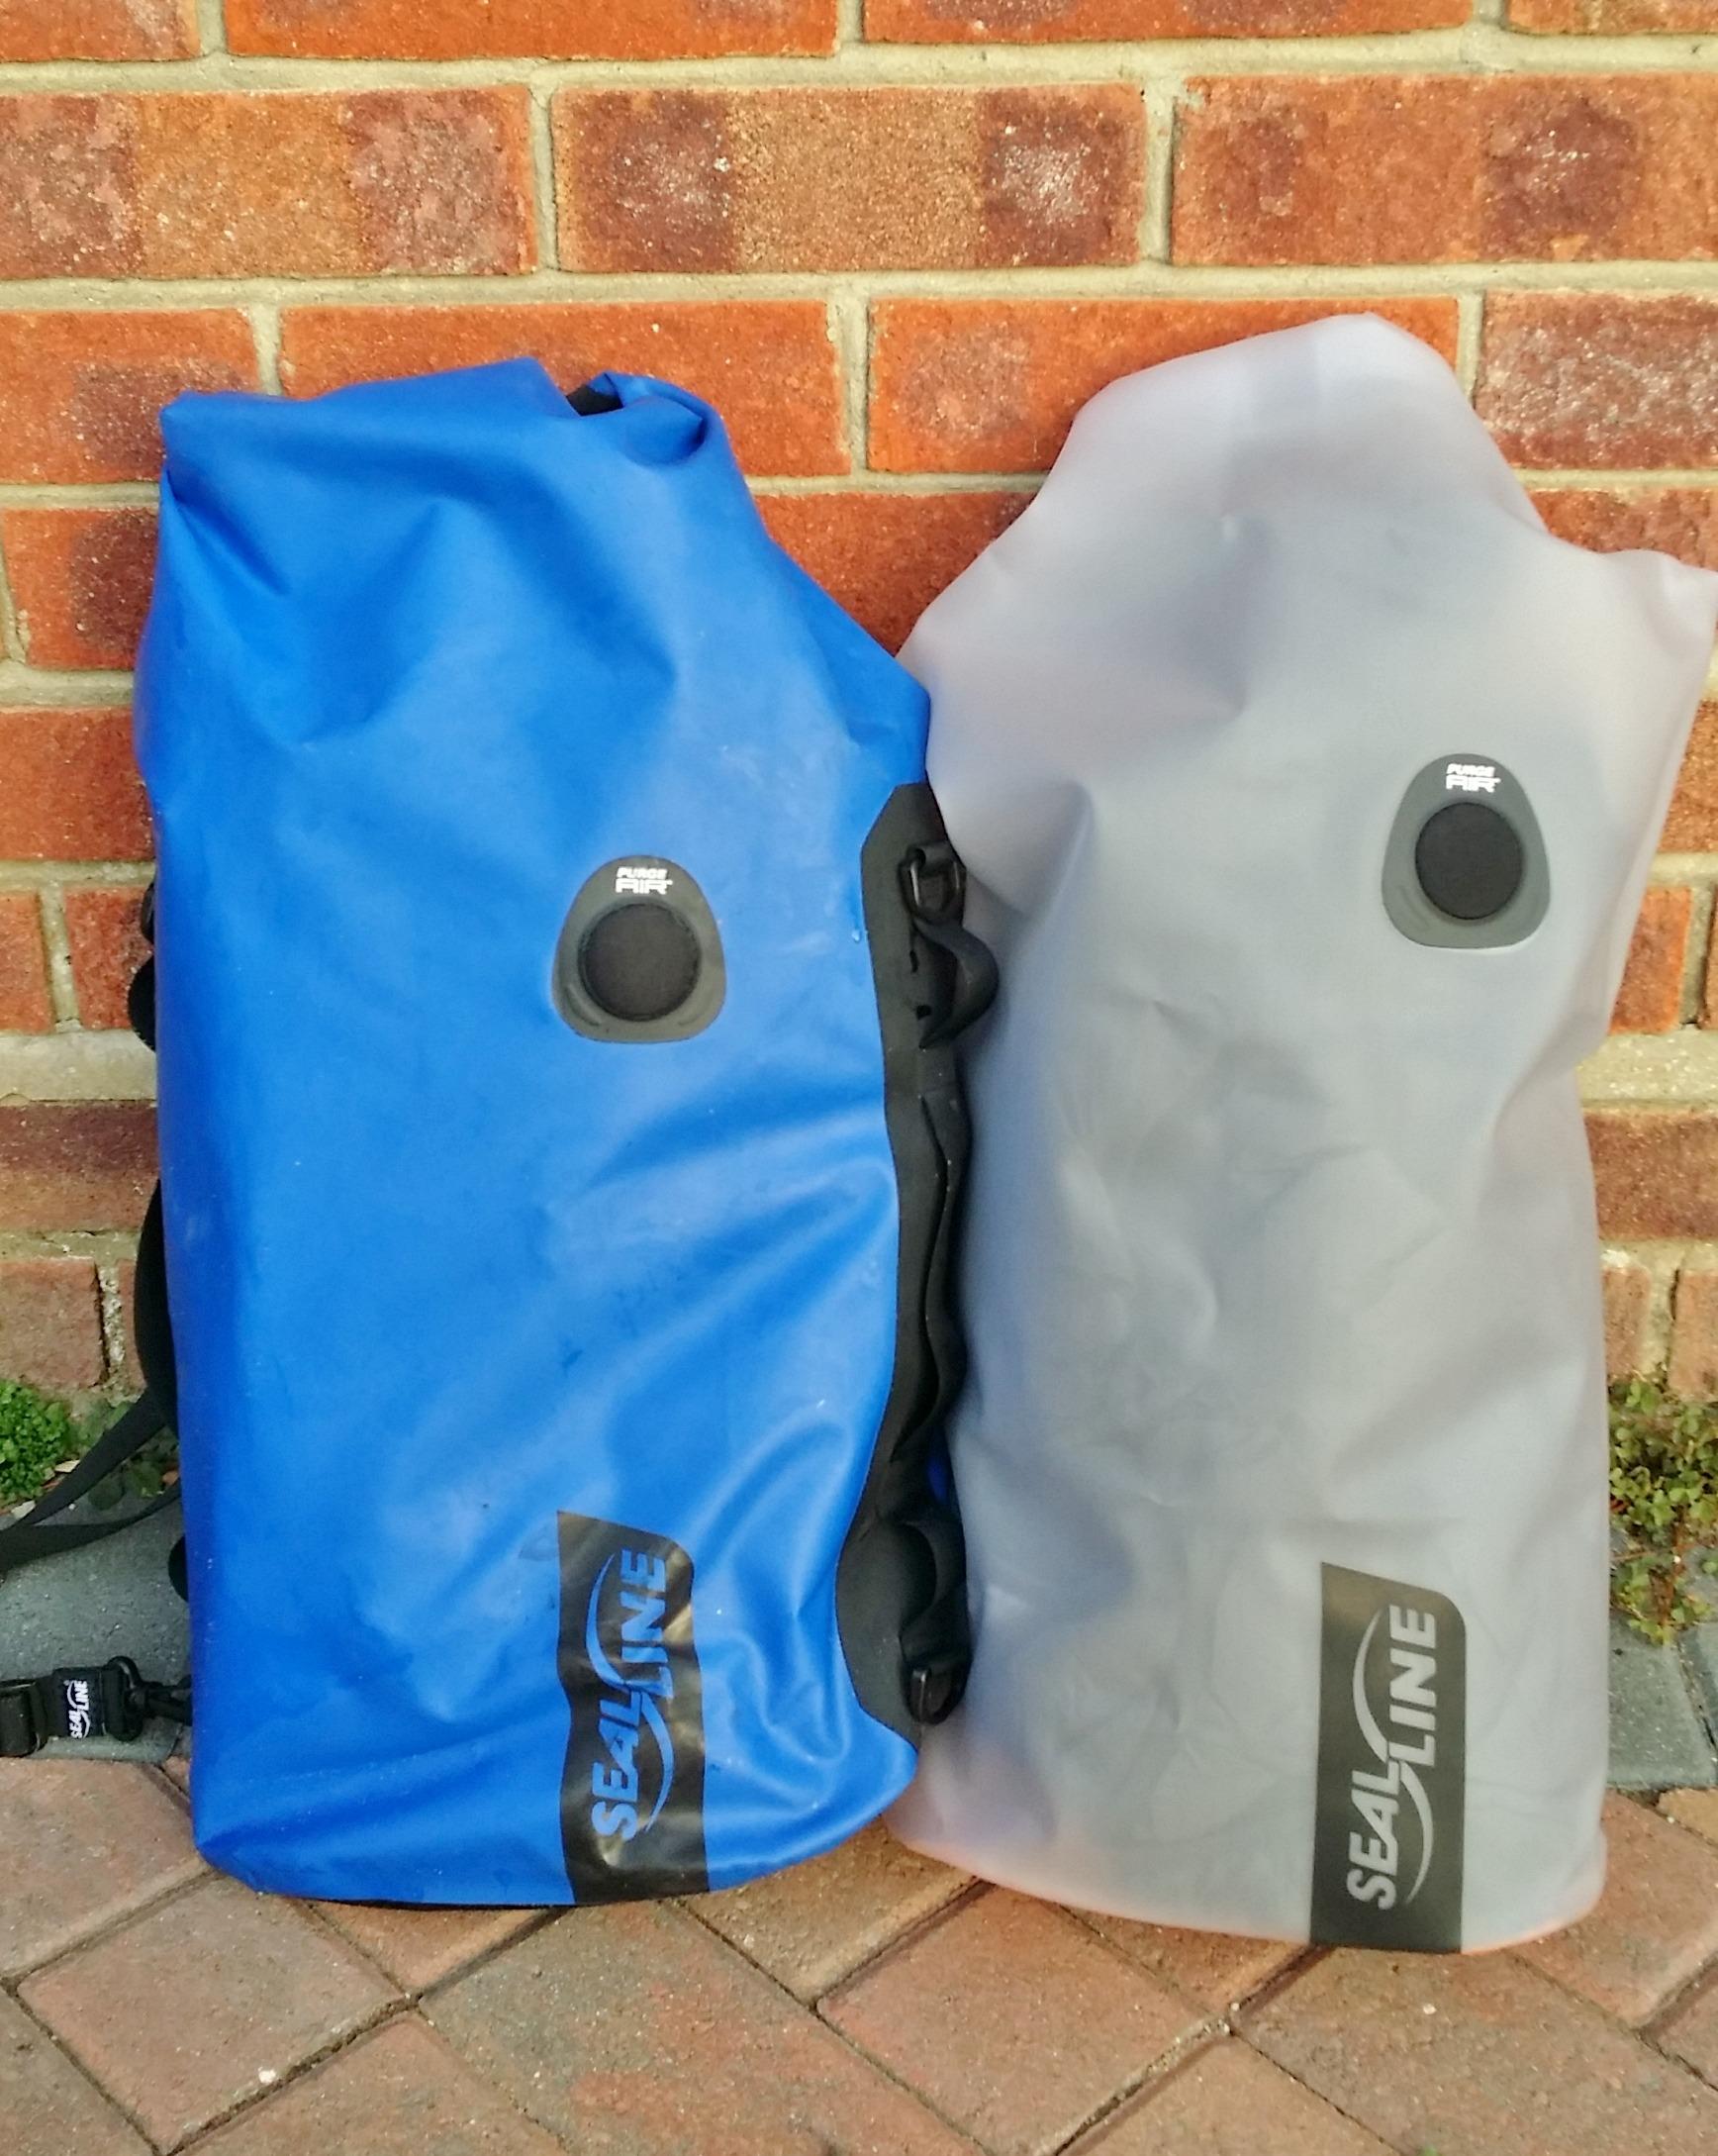 SeaLine dry bags